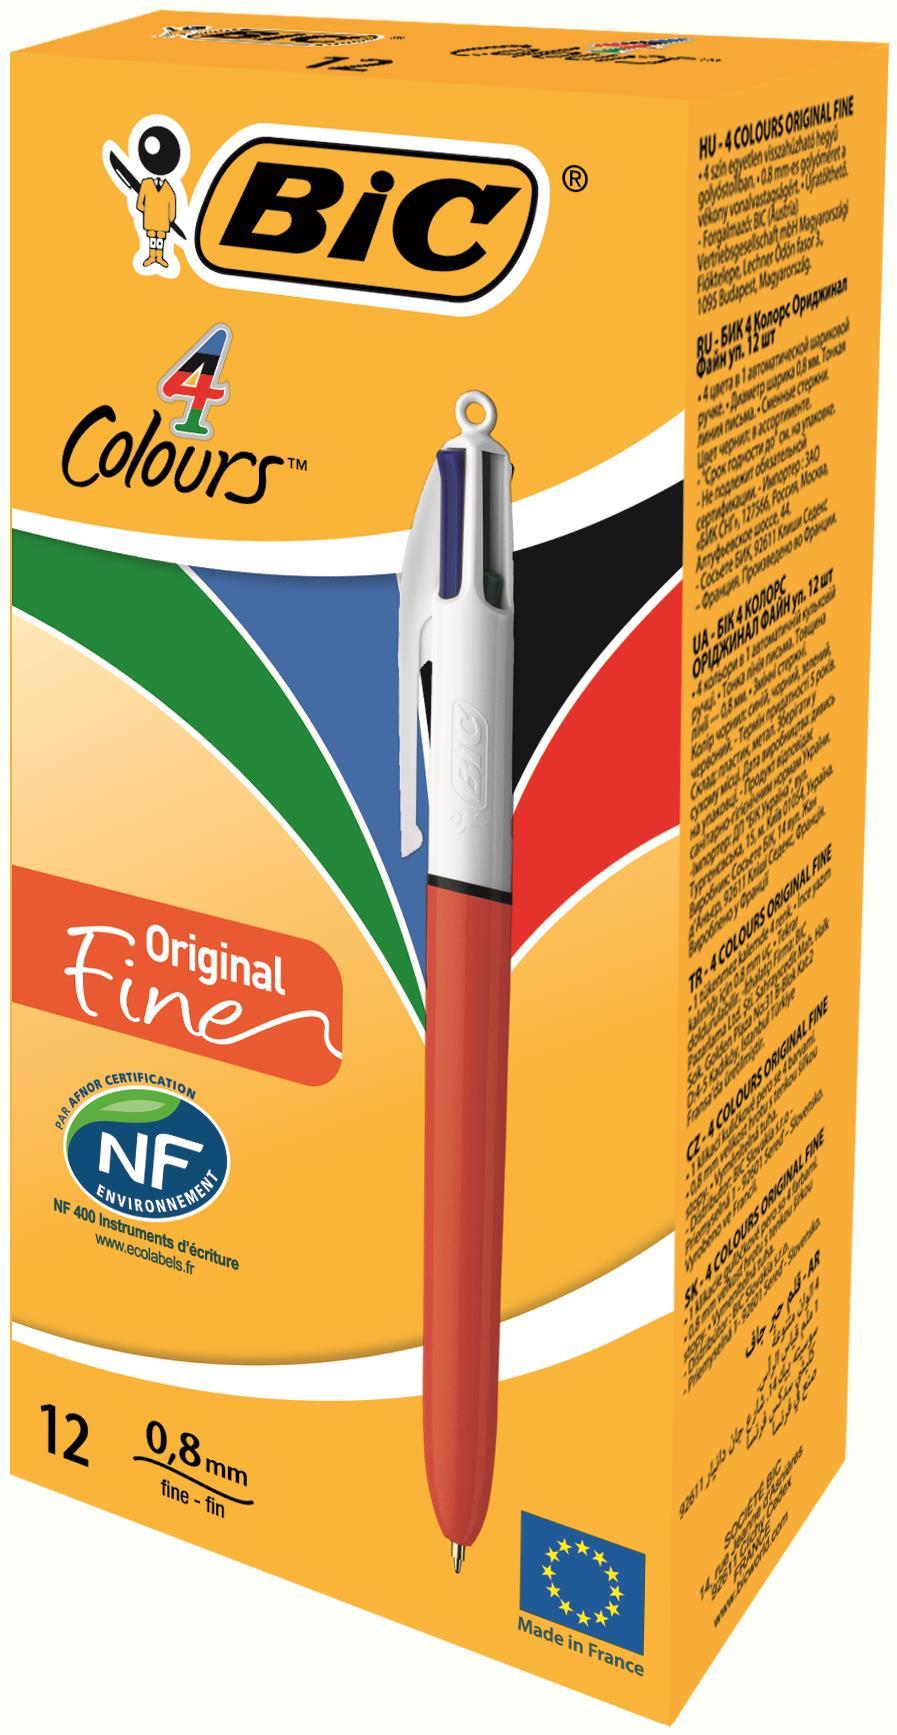 Bic 4 Colour Fine PK12